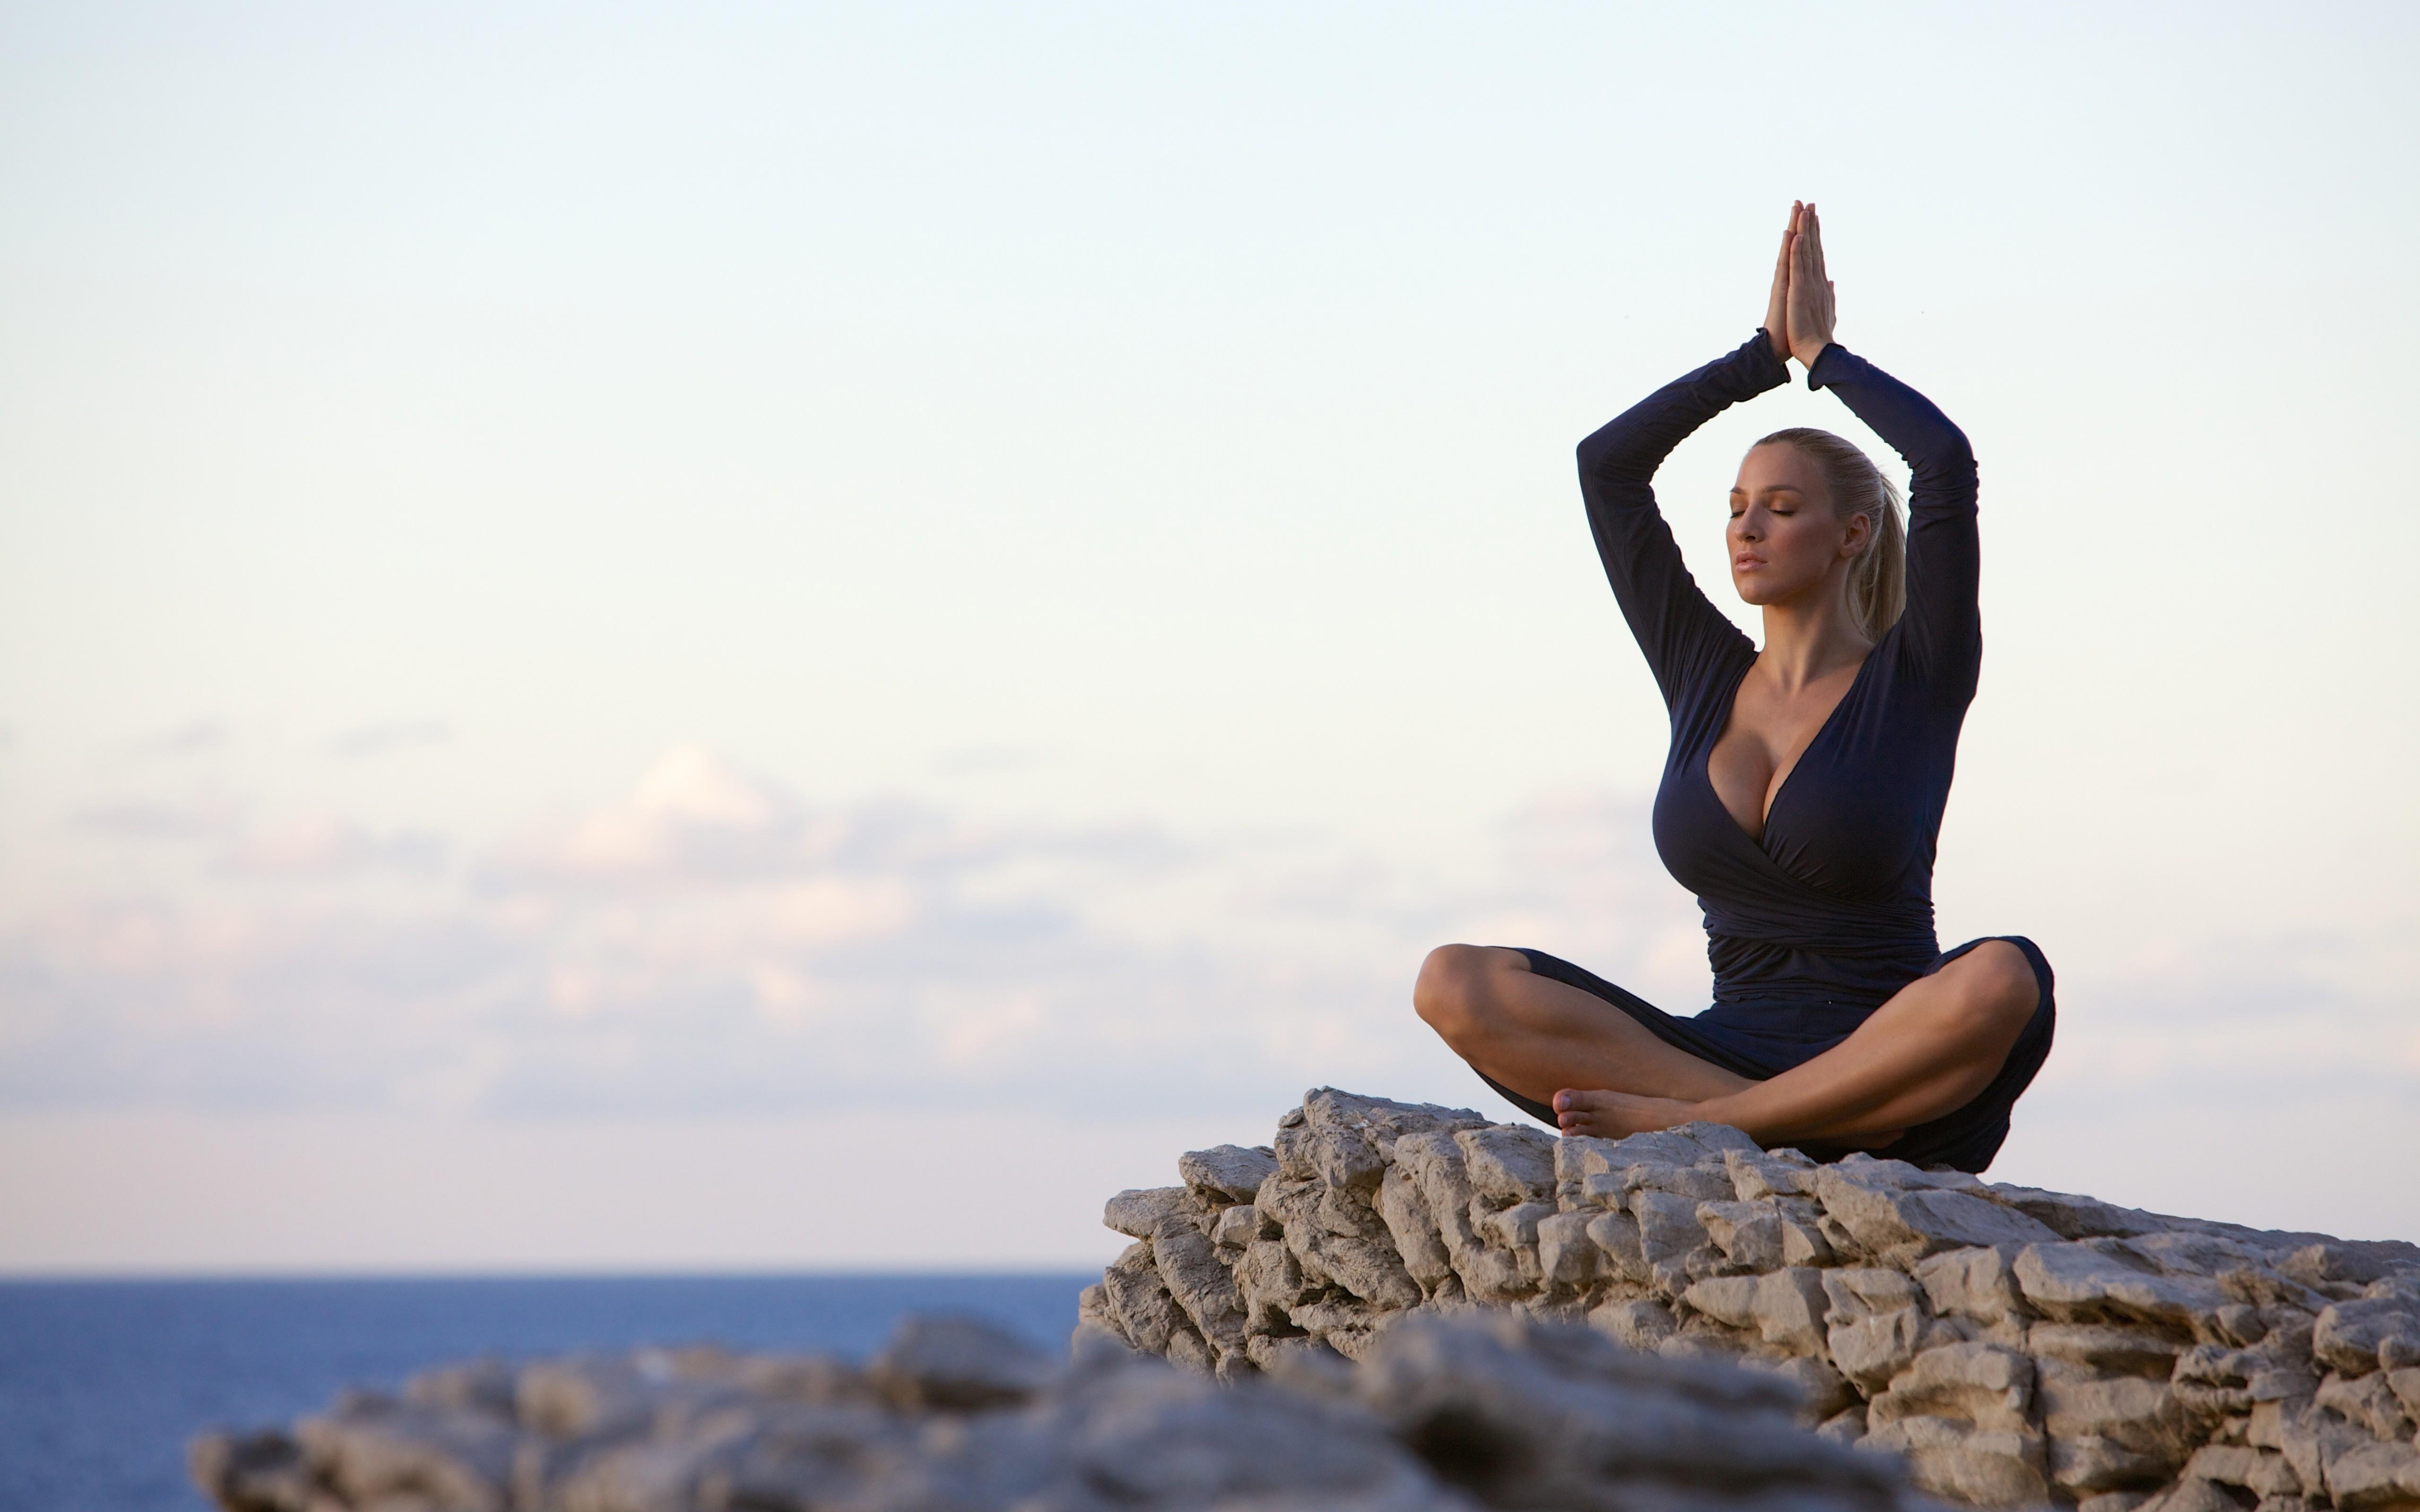 Free Country Girl Wallpaper Free Downloads Wallpaper Women Jordan Carver Big Boobs Yoga